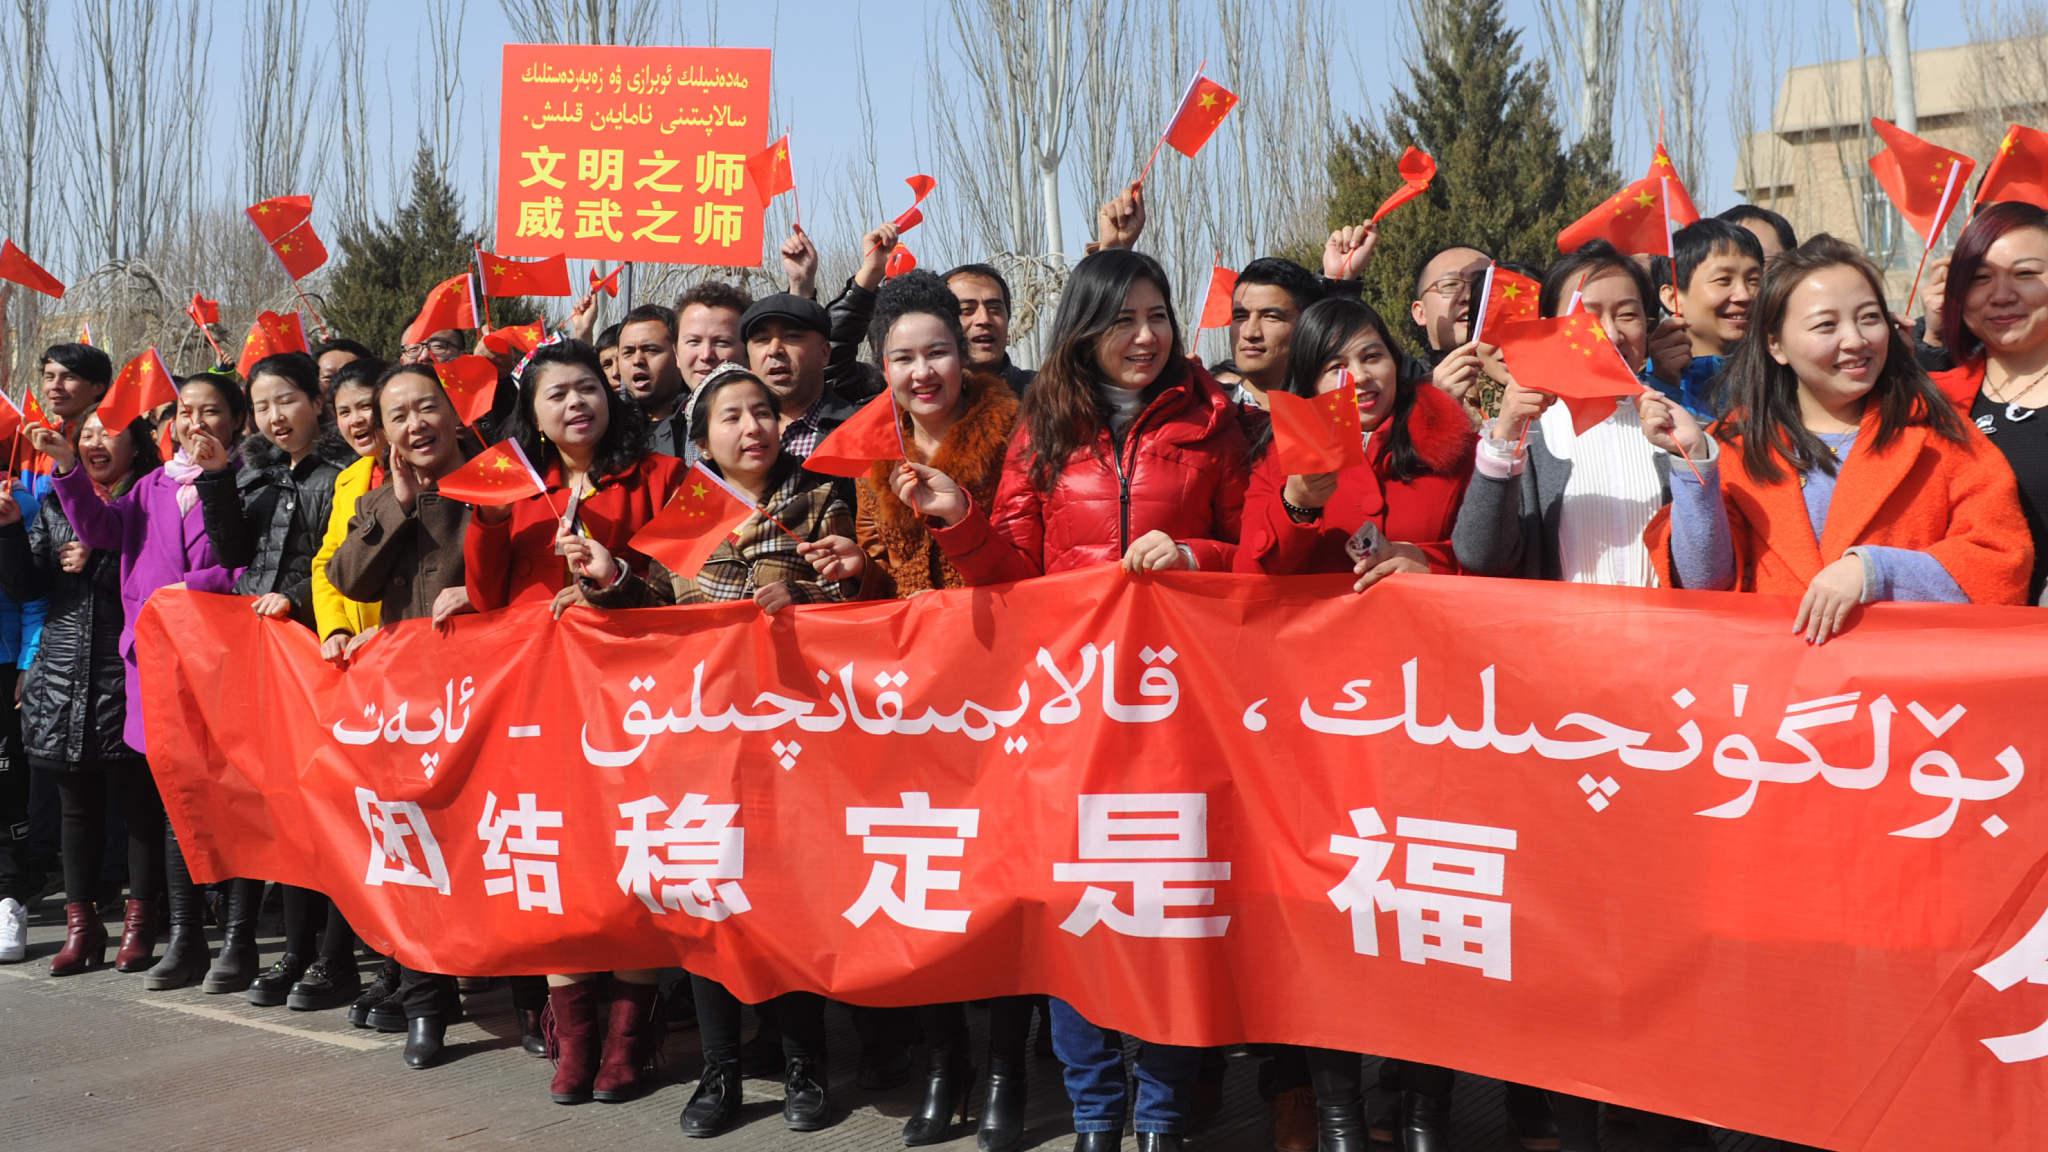 Xinjiang governor: Vocational education program is terrorism prevention